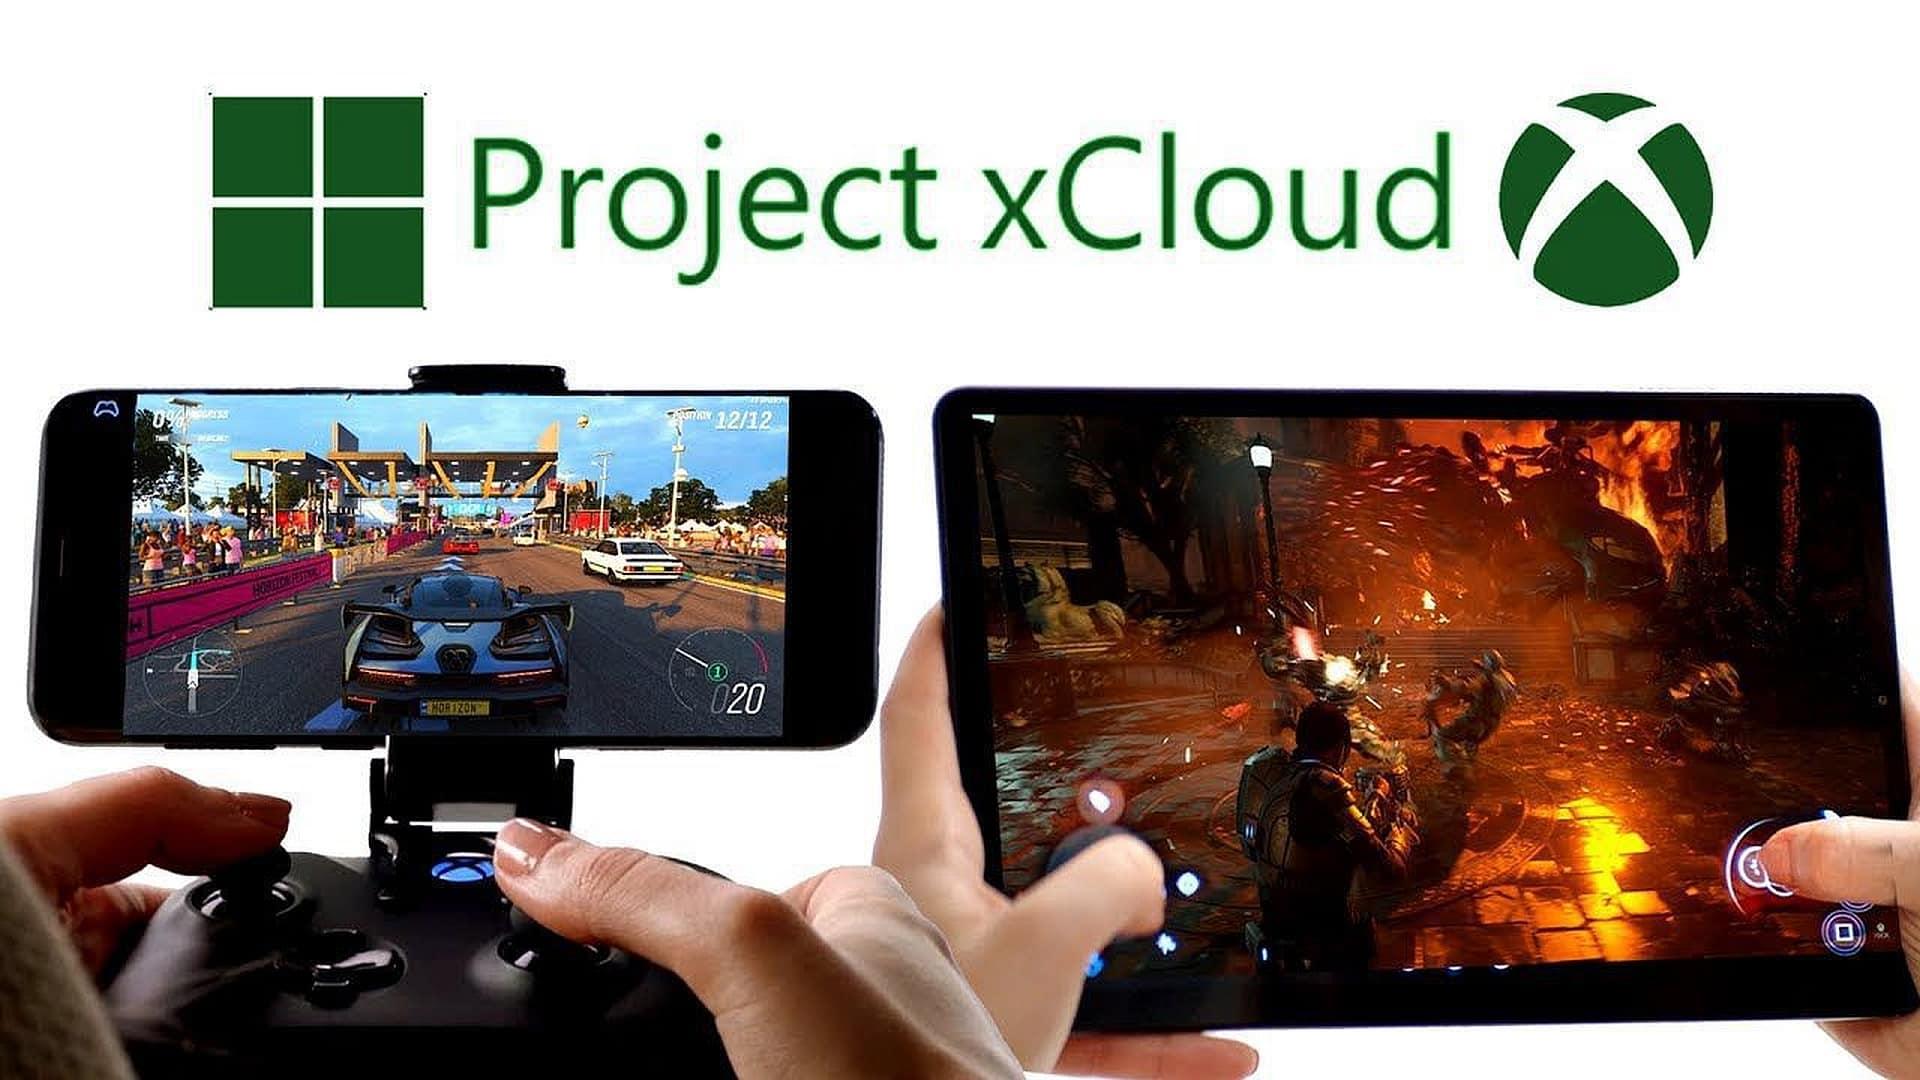 projecto xCloud